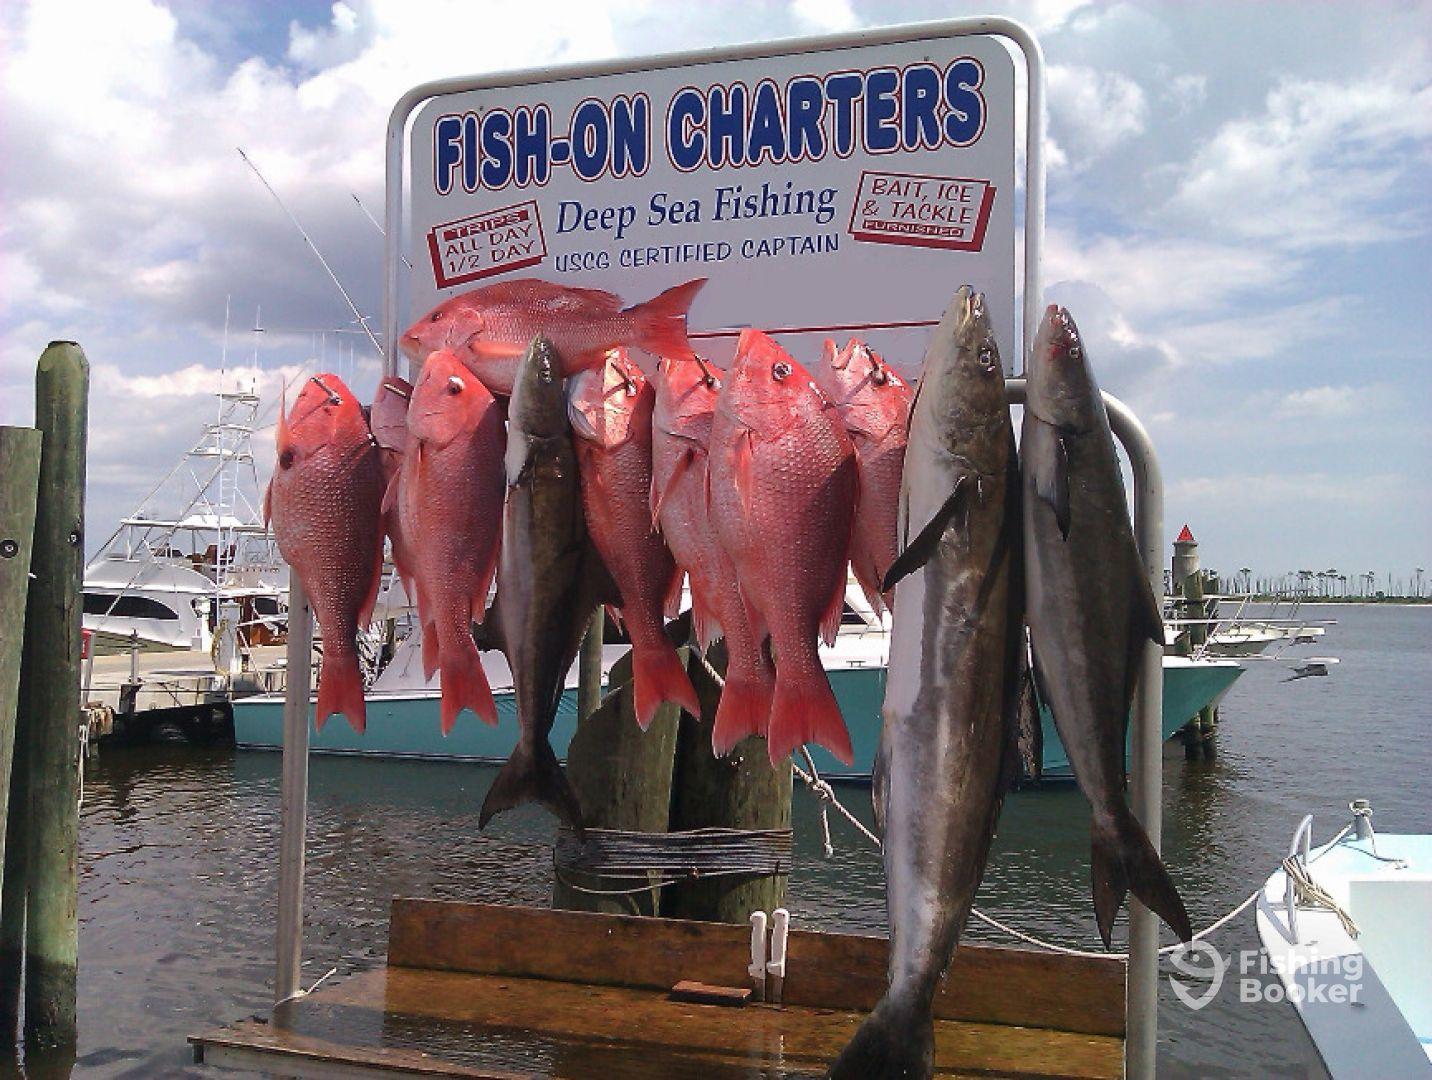 Fish on charters biloxi ms fishingbooker for Fishing in biloxi ms